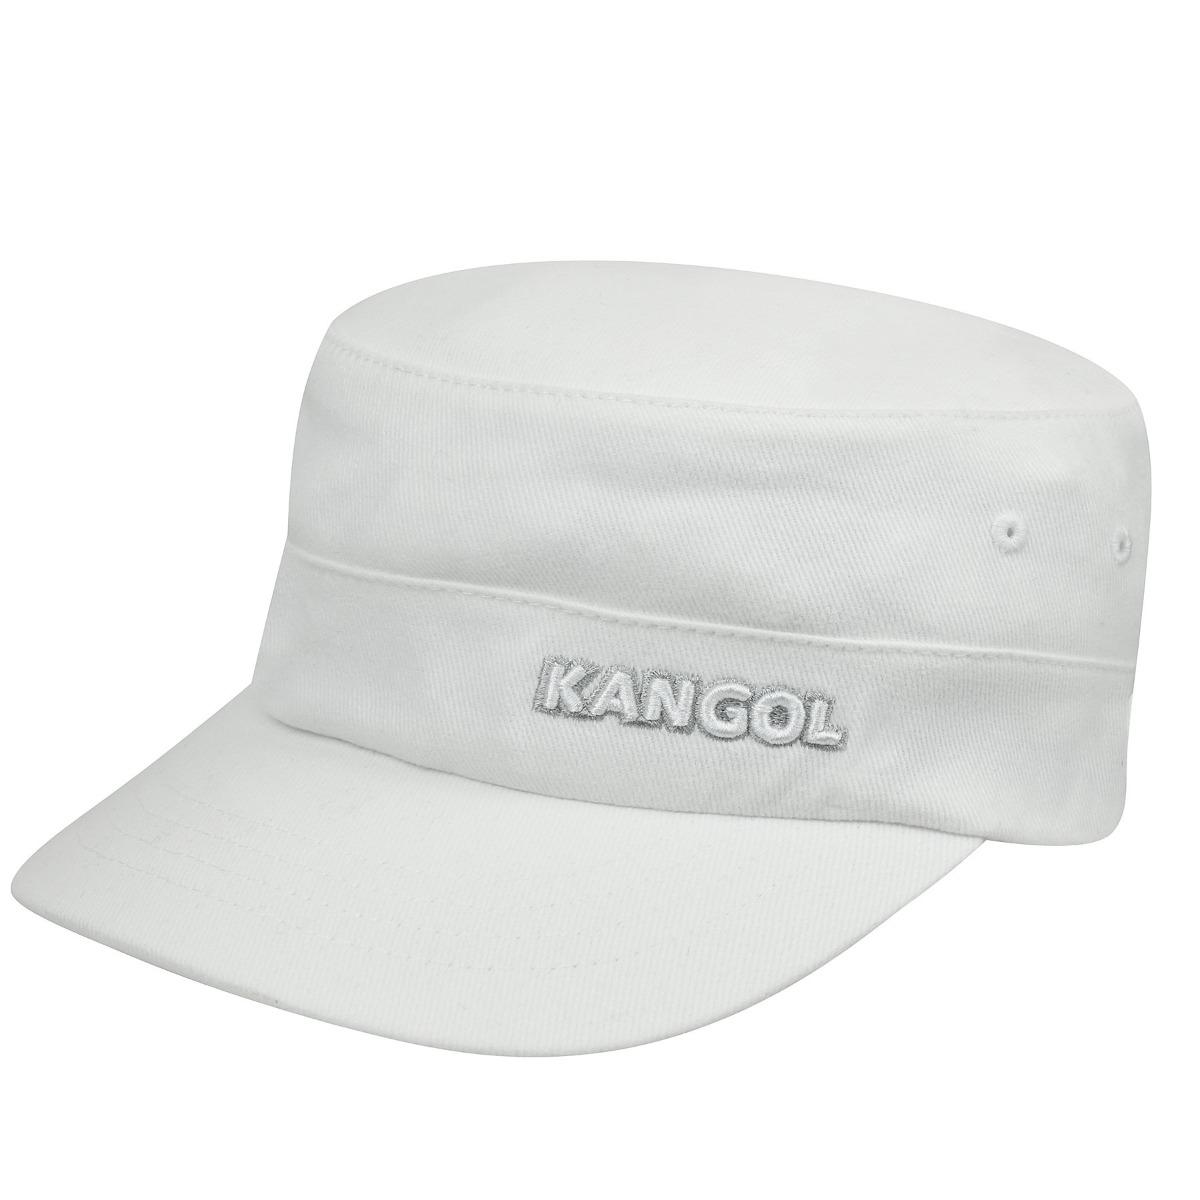 Kangol Cotton Twill Army Cap in White